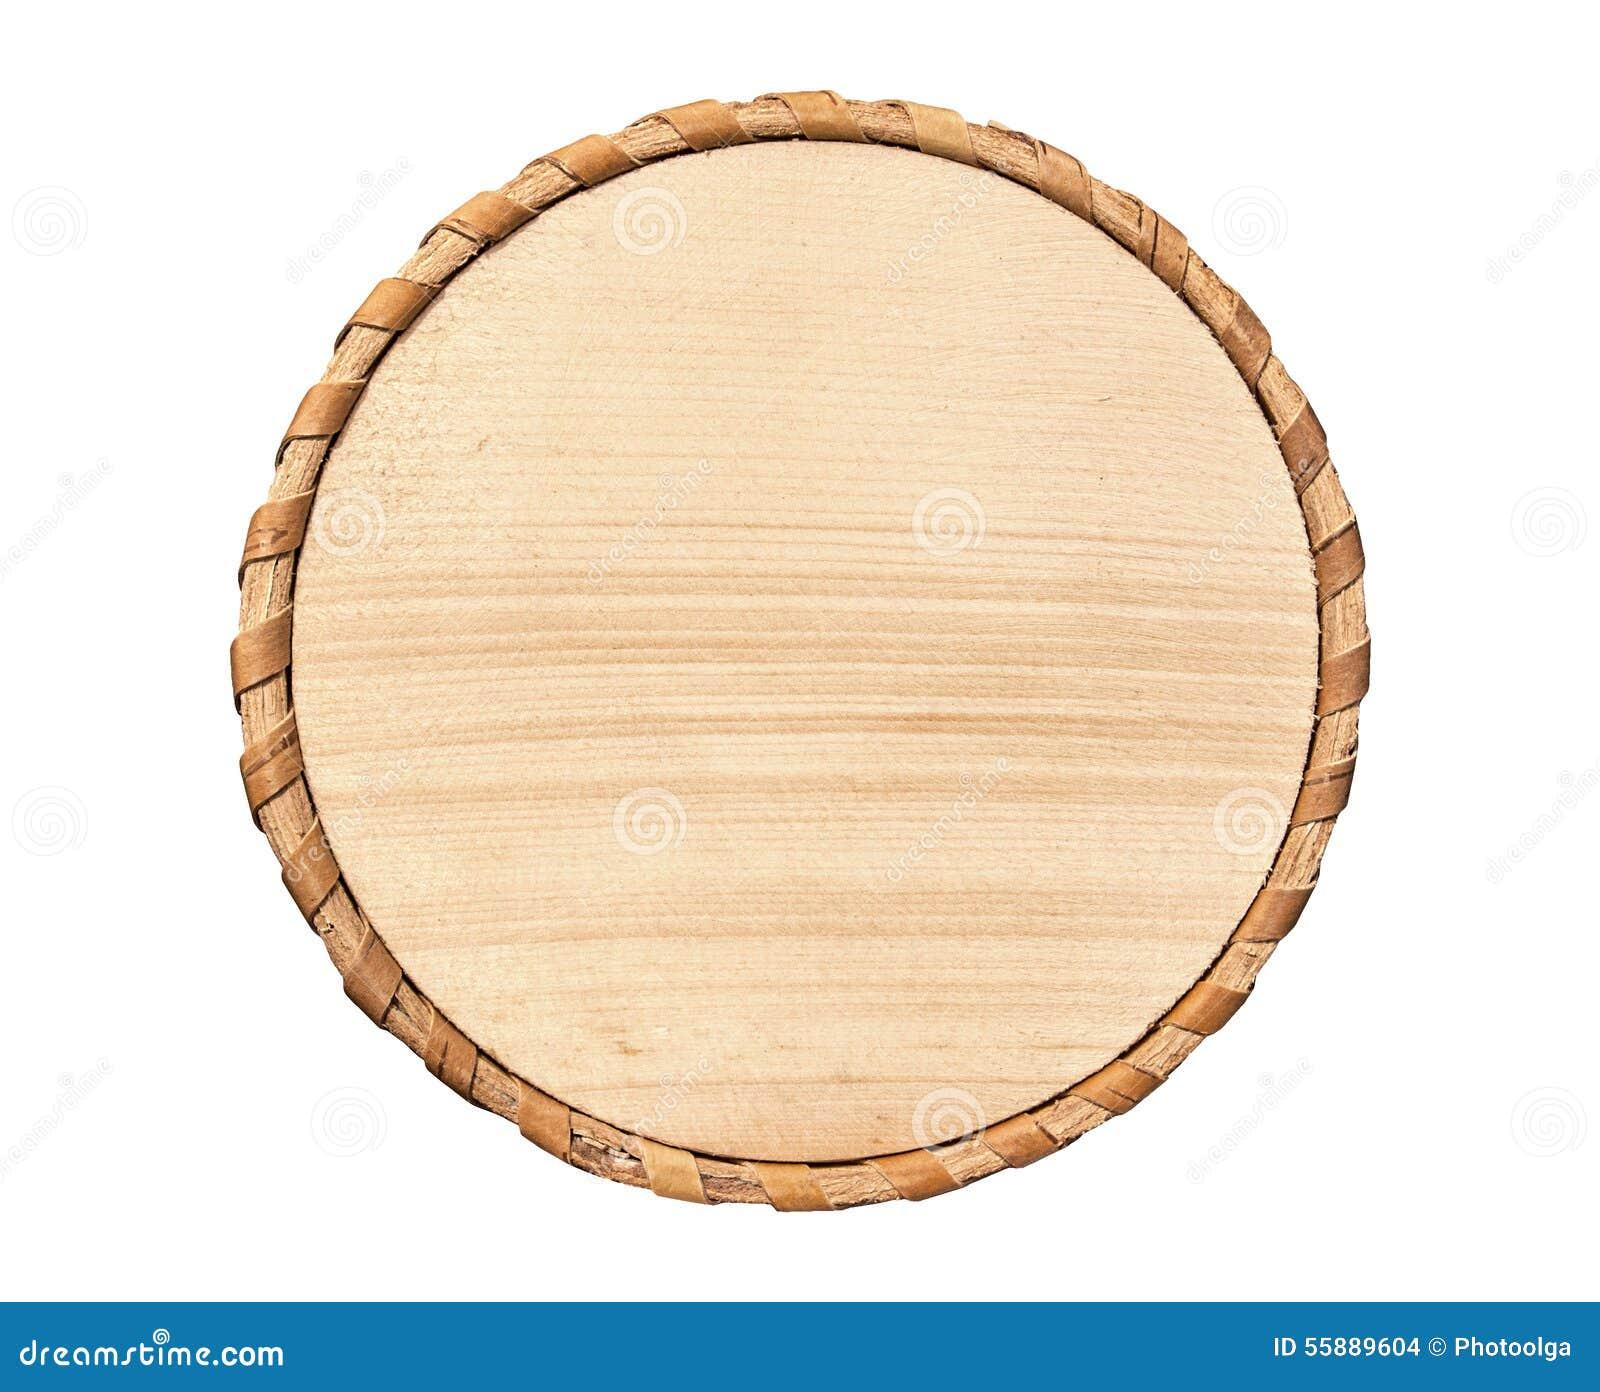 Wooden Circle Stock Photo Image 55889604